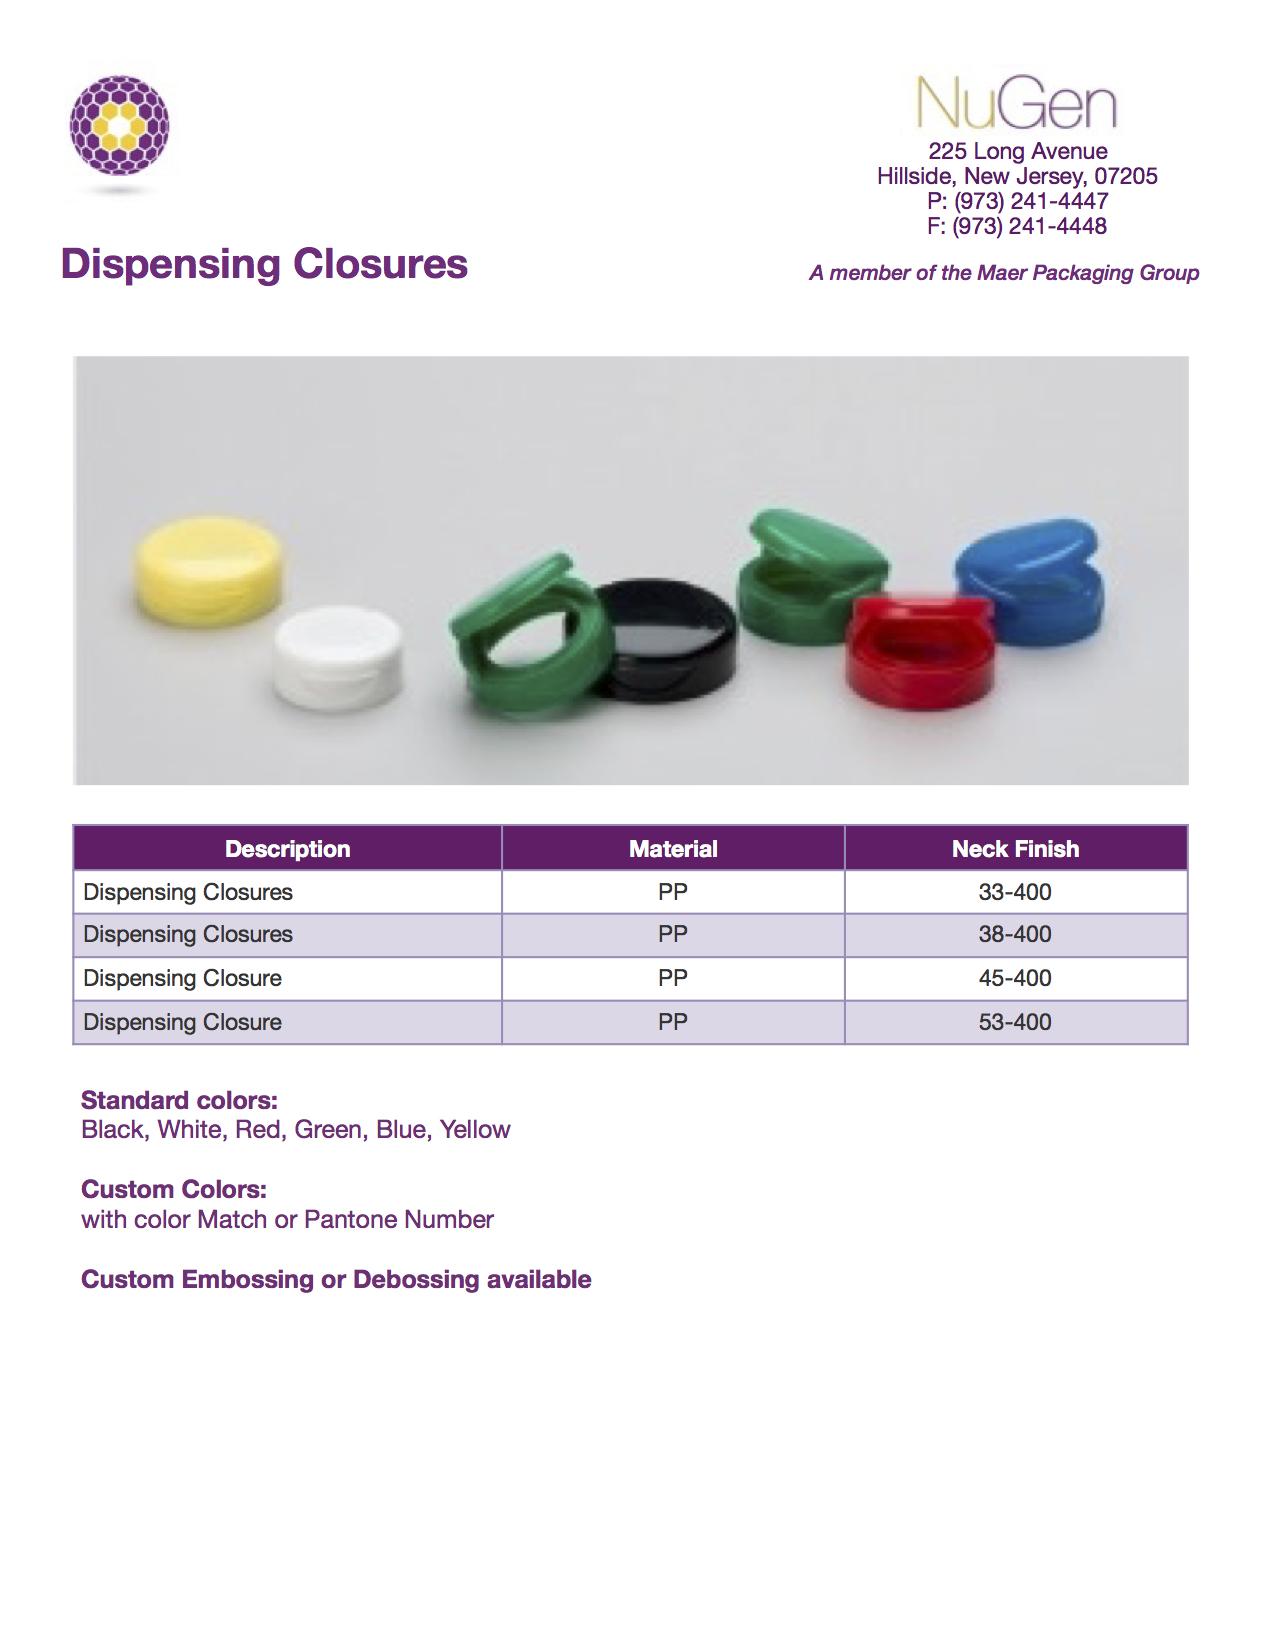 Dispensing Closure 12-3-2015